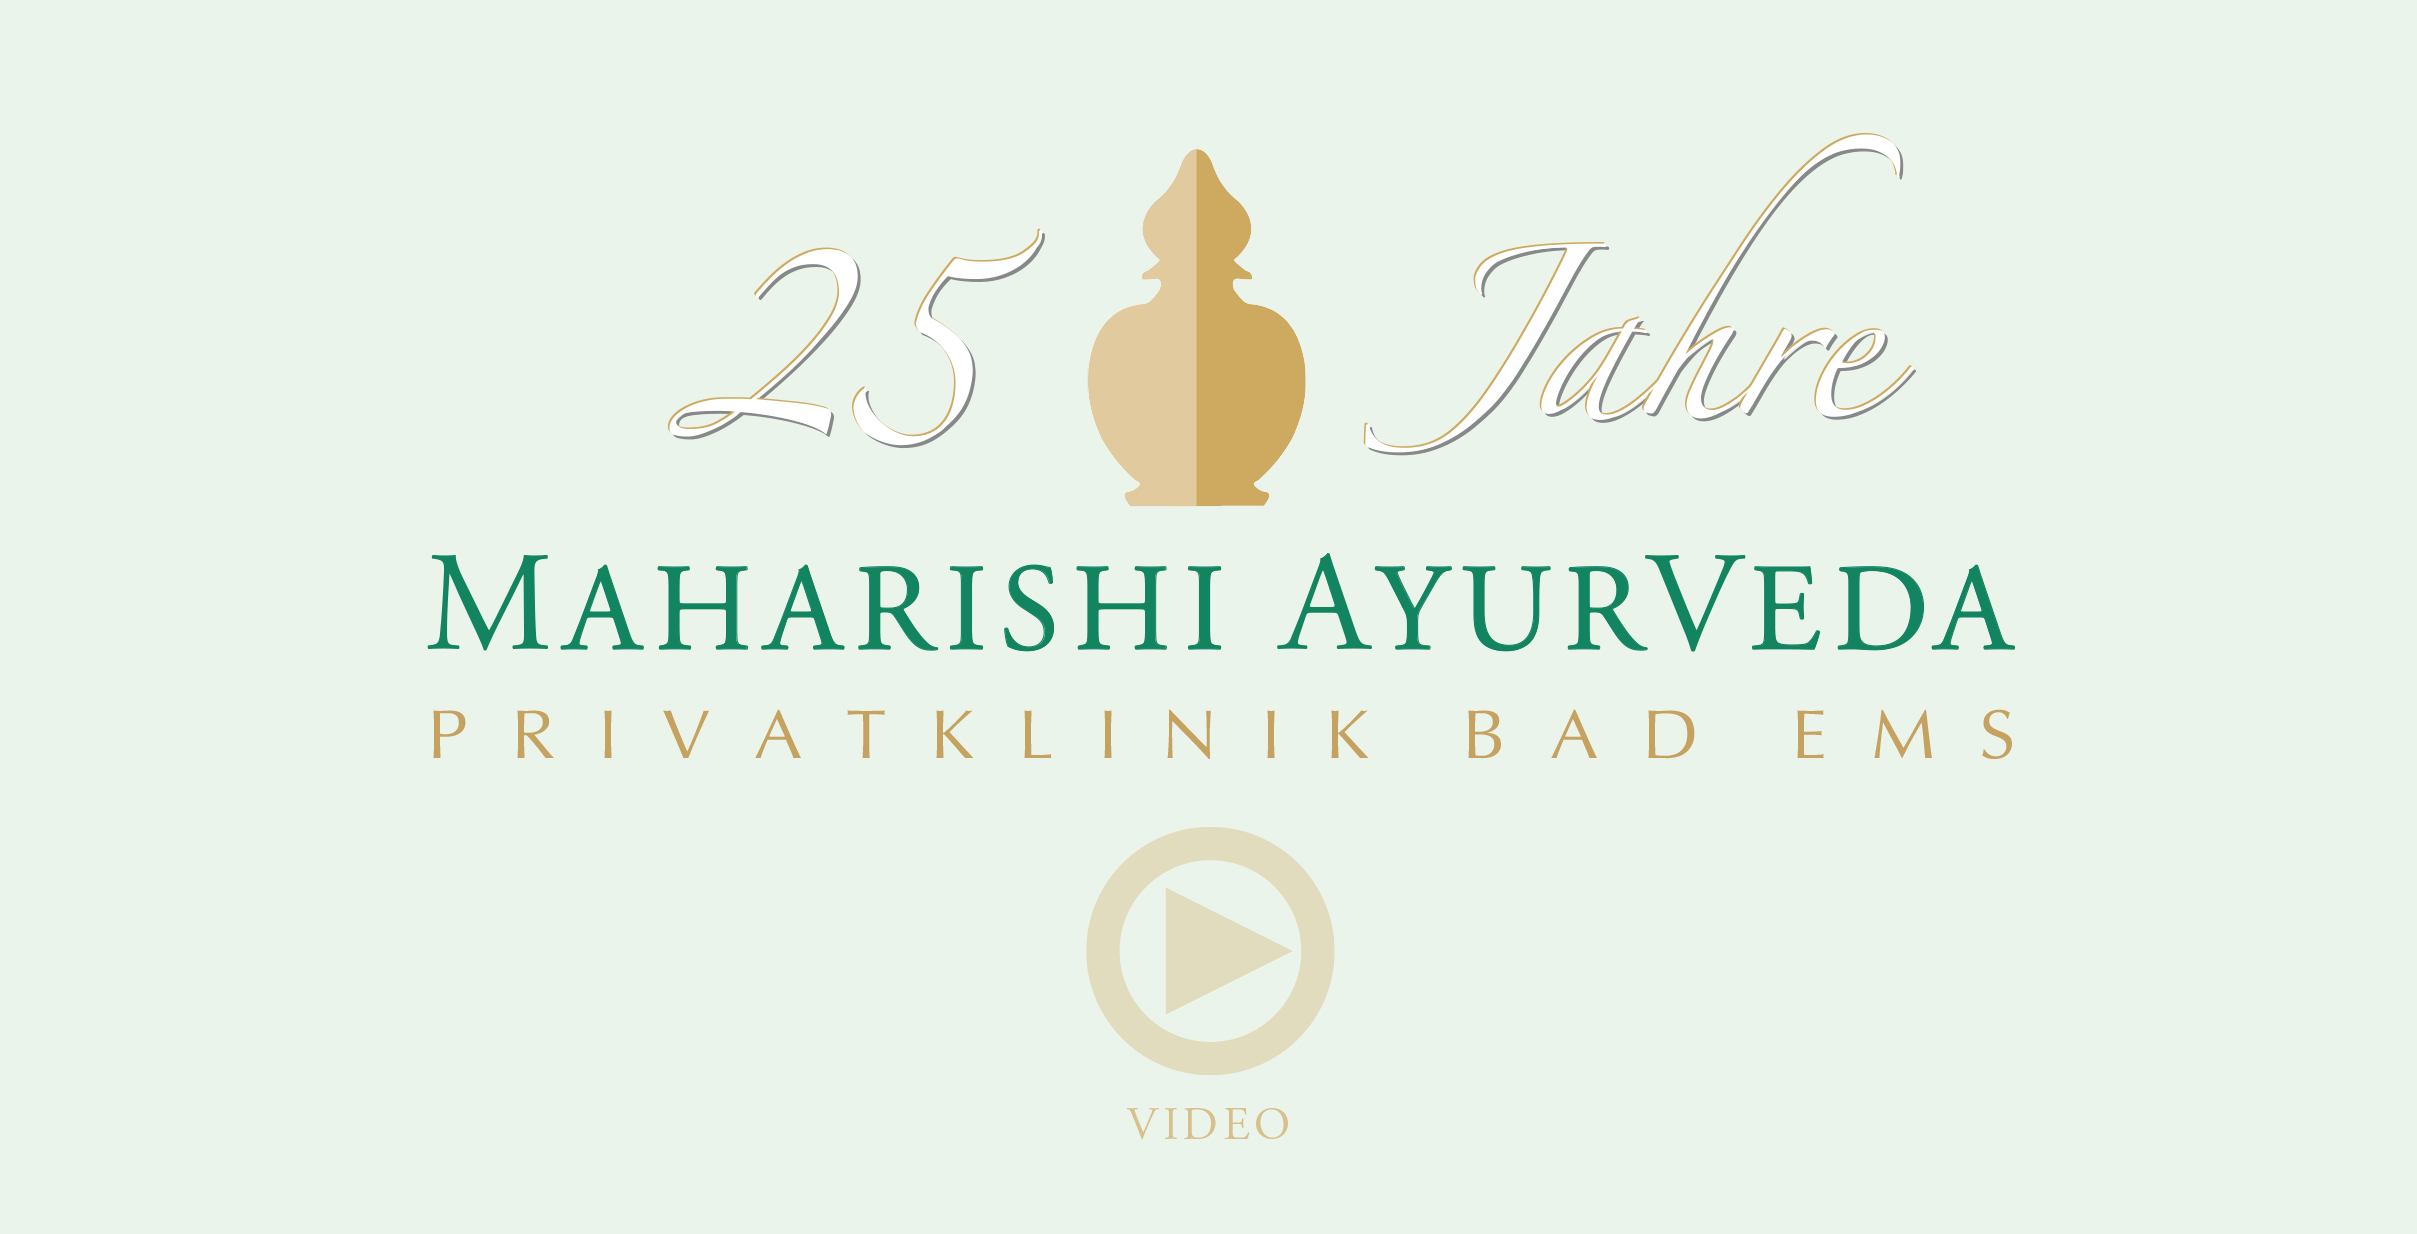 25-jähriges Jubiläum, Videotitel